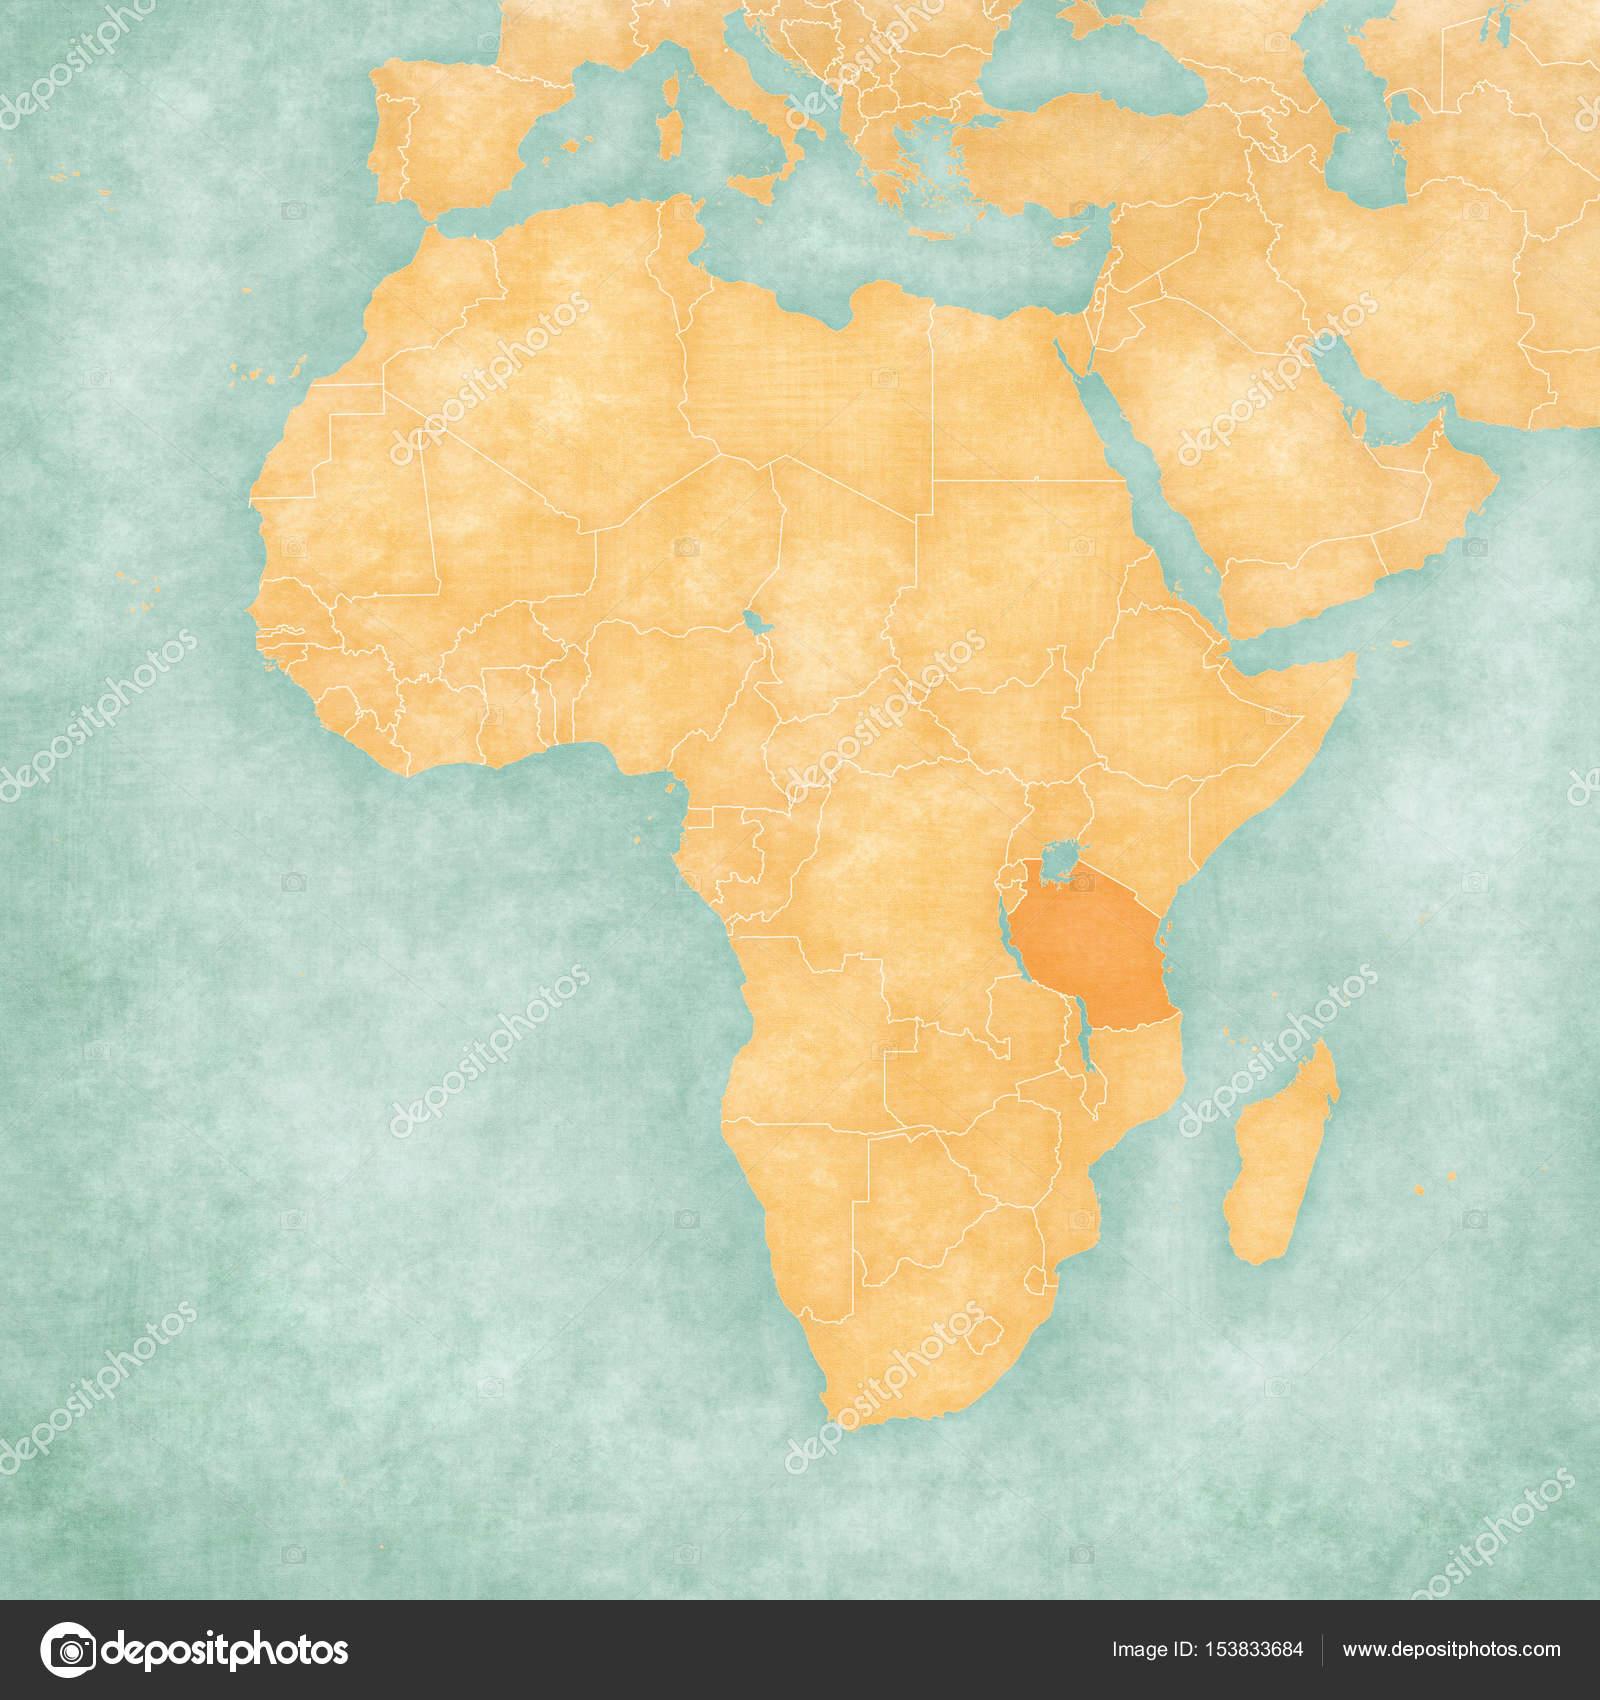 Tanzania On A Map Of Africa.Map Of Africa Tanzania Stock Photo C Tindo 153833684